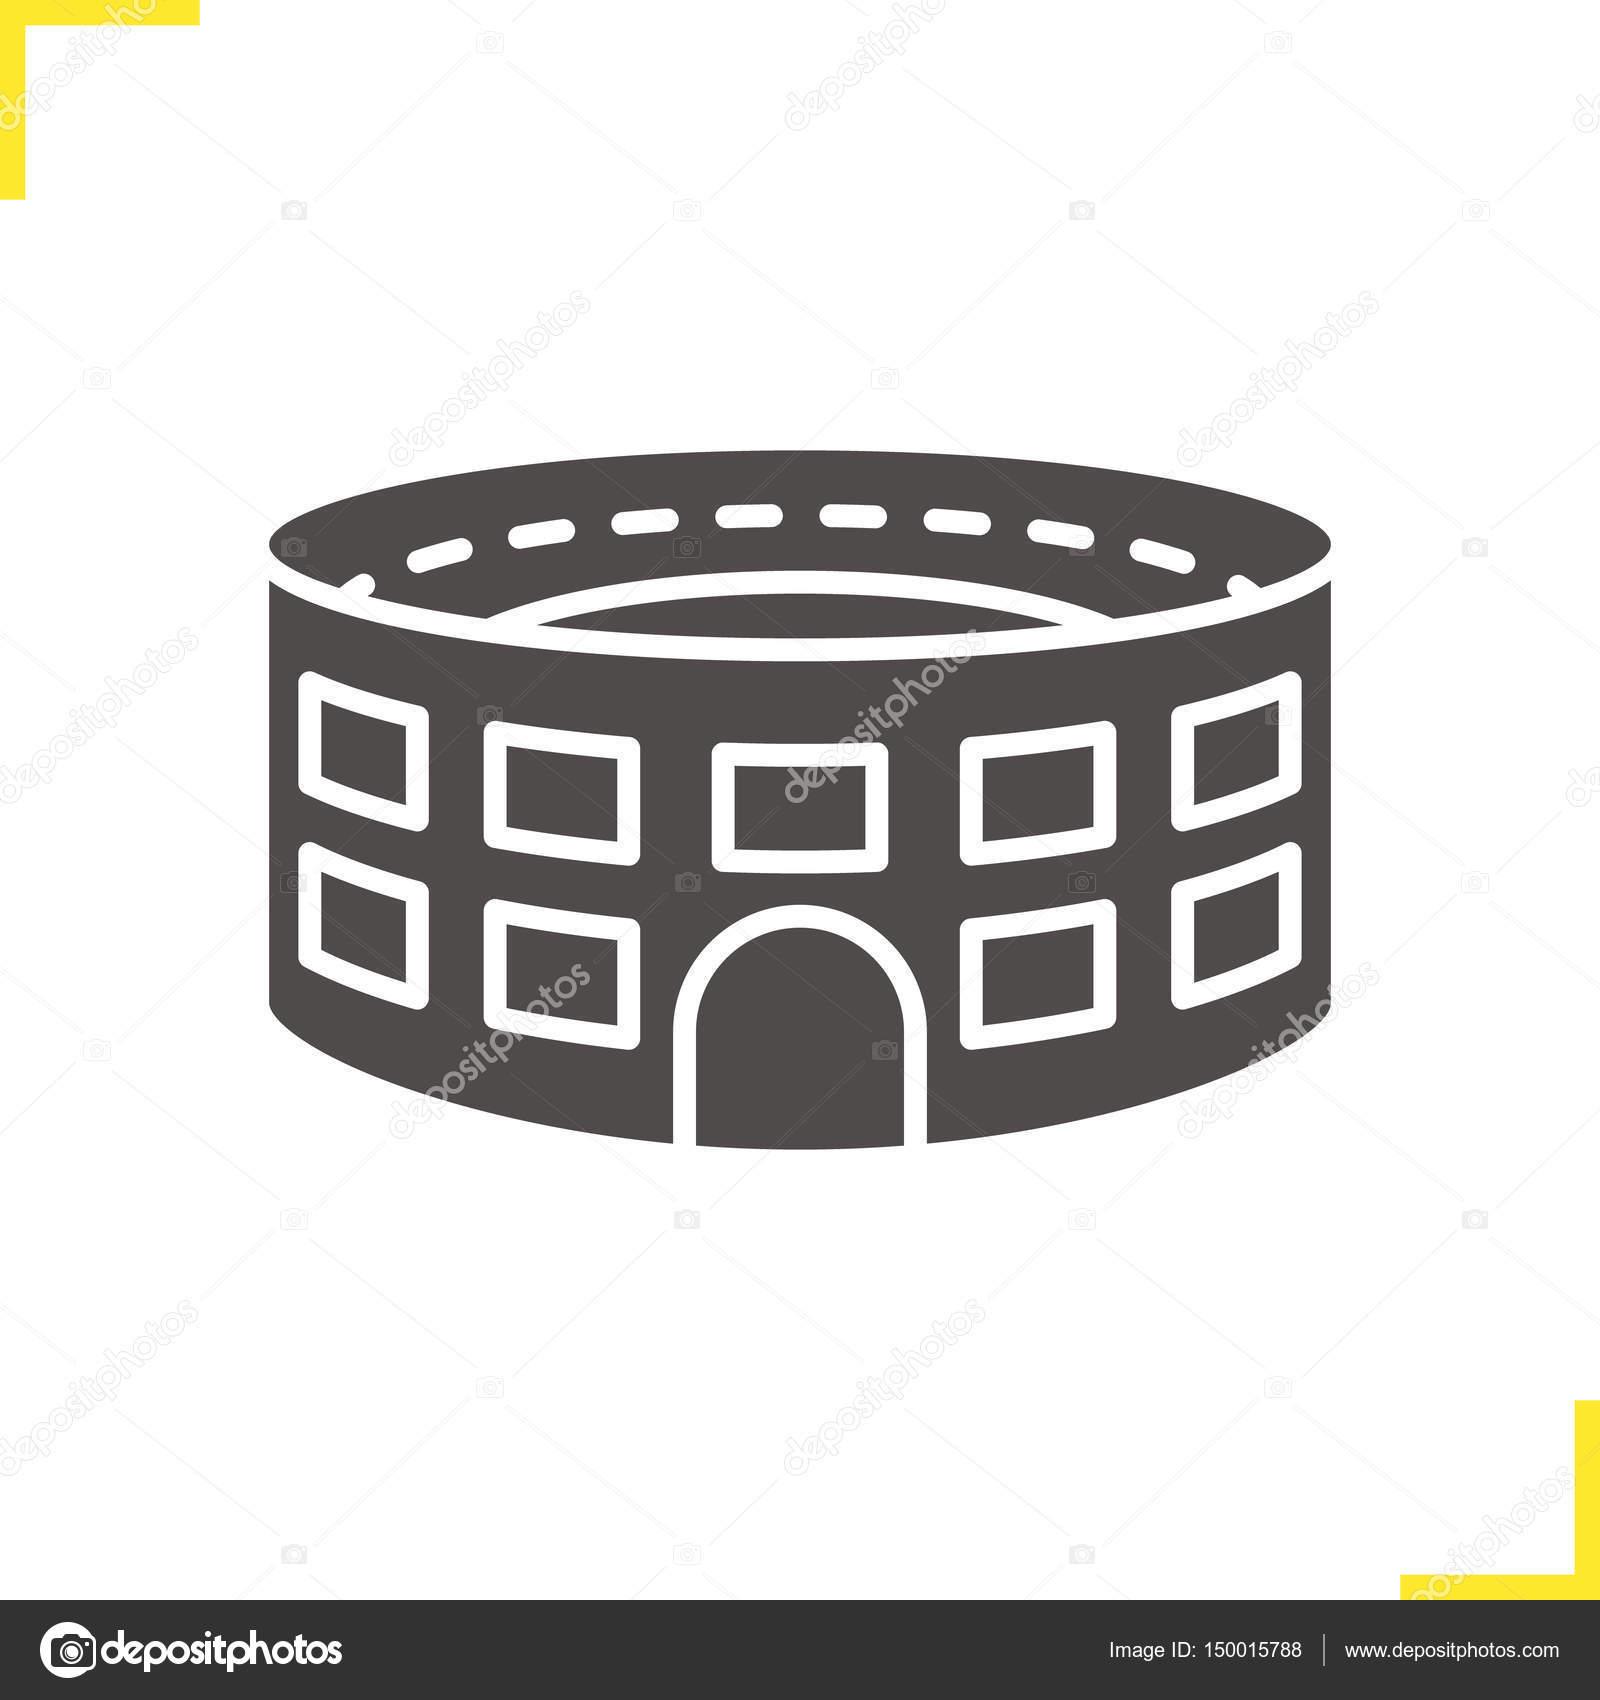 Stadium building icon stock vector bsd 150015788 stadium building icon stock vector biocorpaavc